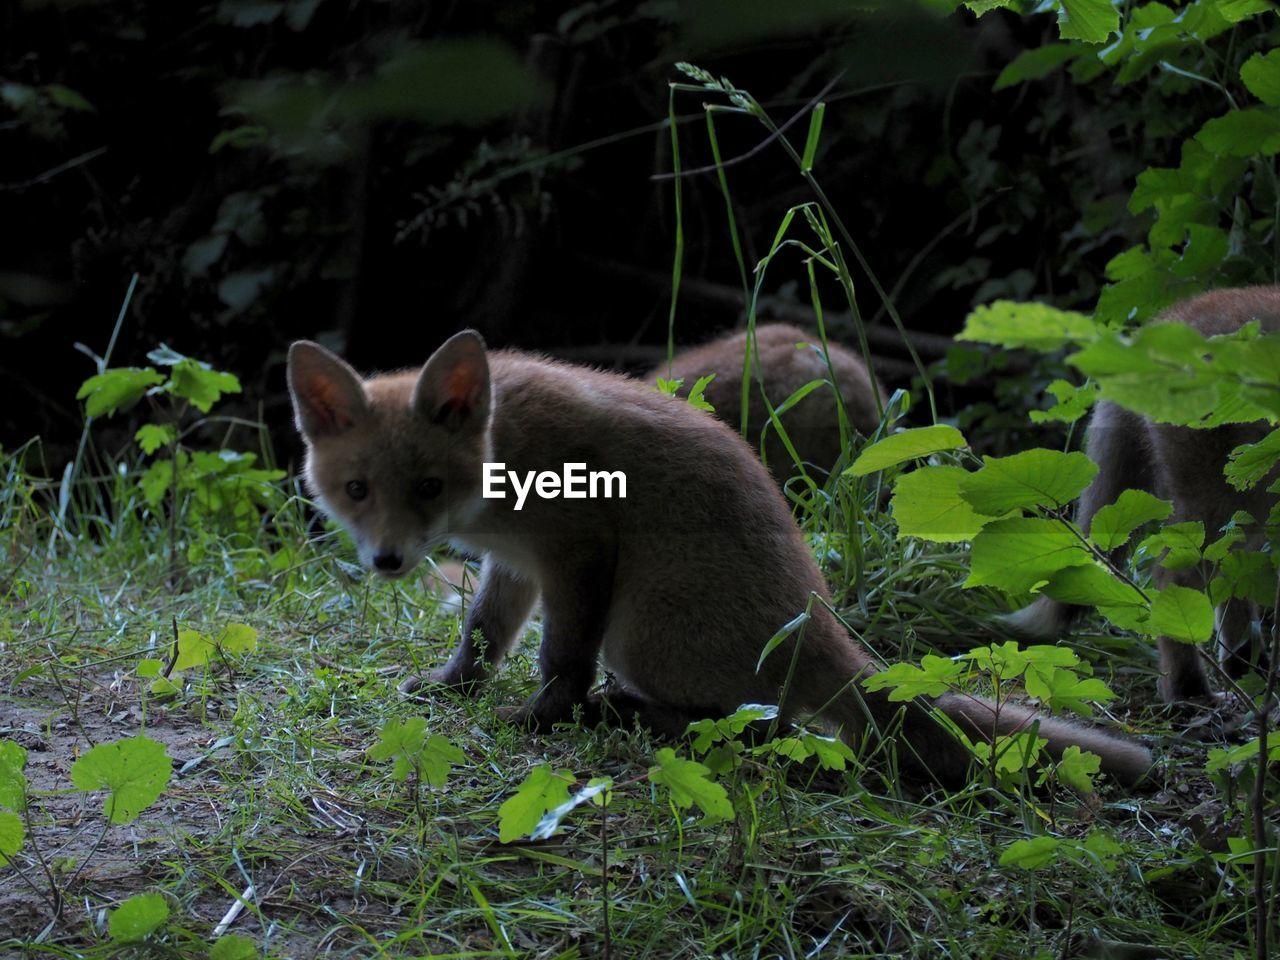 Fox cubs playing at dusk